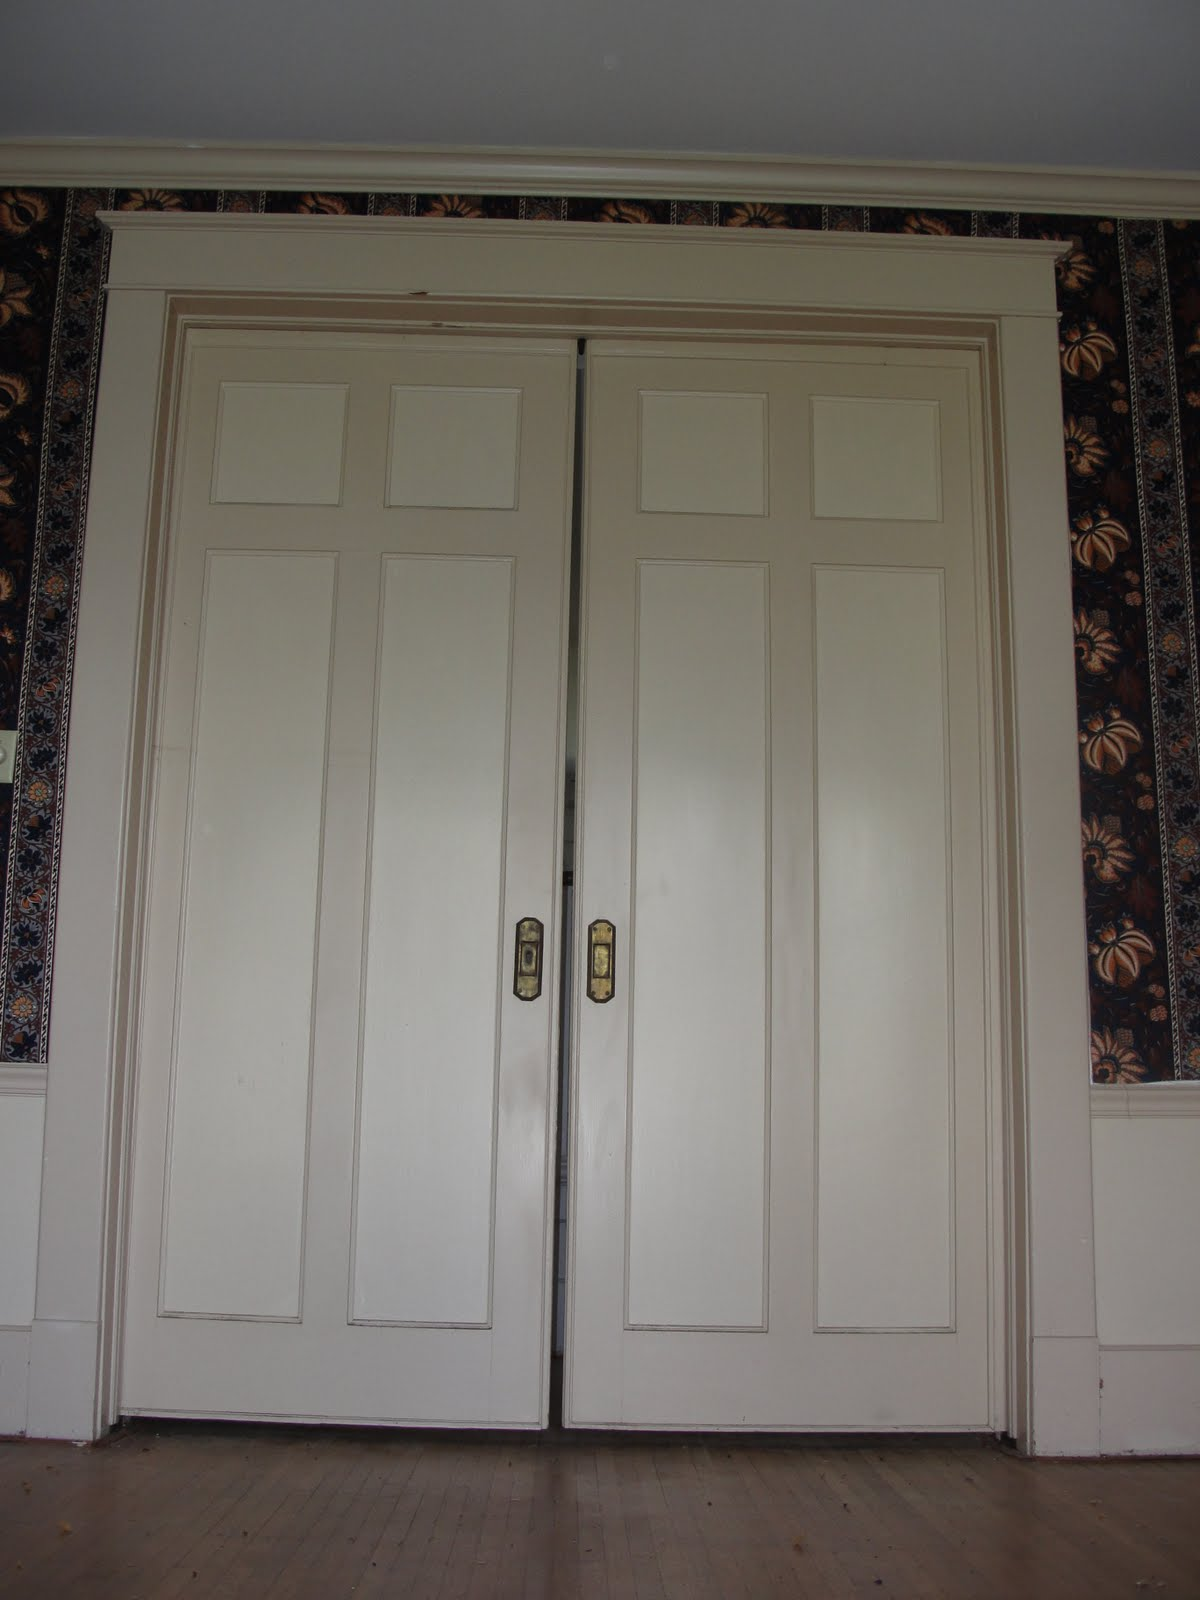 Collection Pella 25 Series Sliding Door Pictures Woonv Pella 25 Series  Sliding Door Btca Info Examples